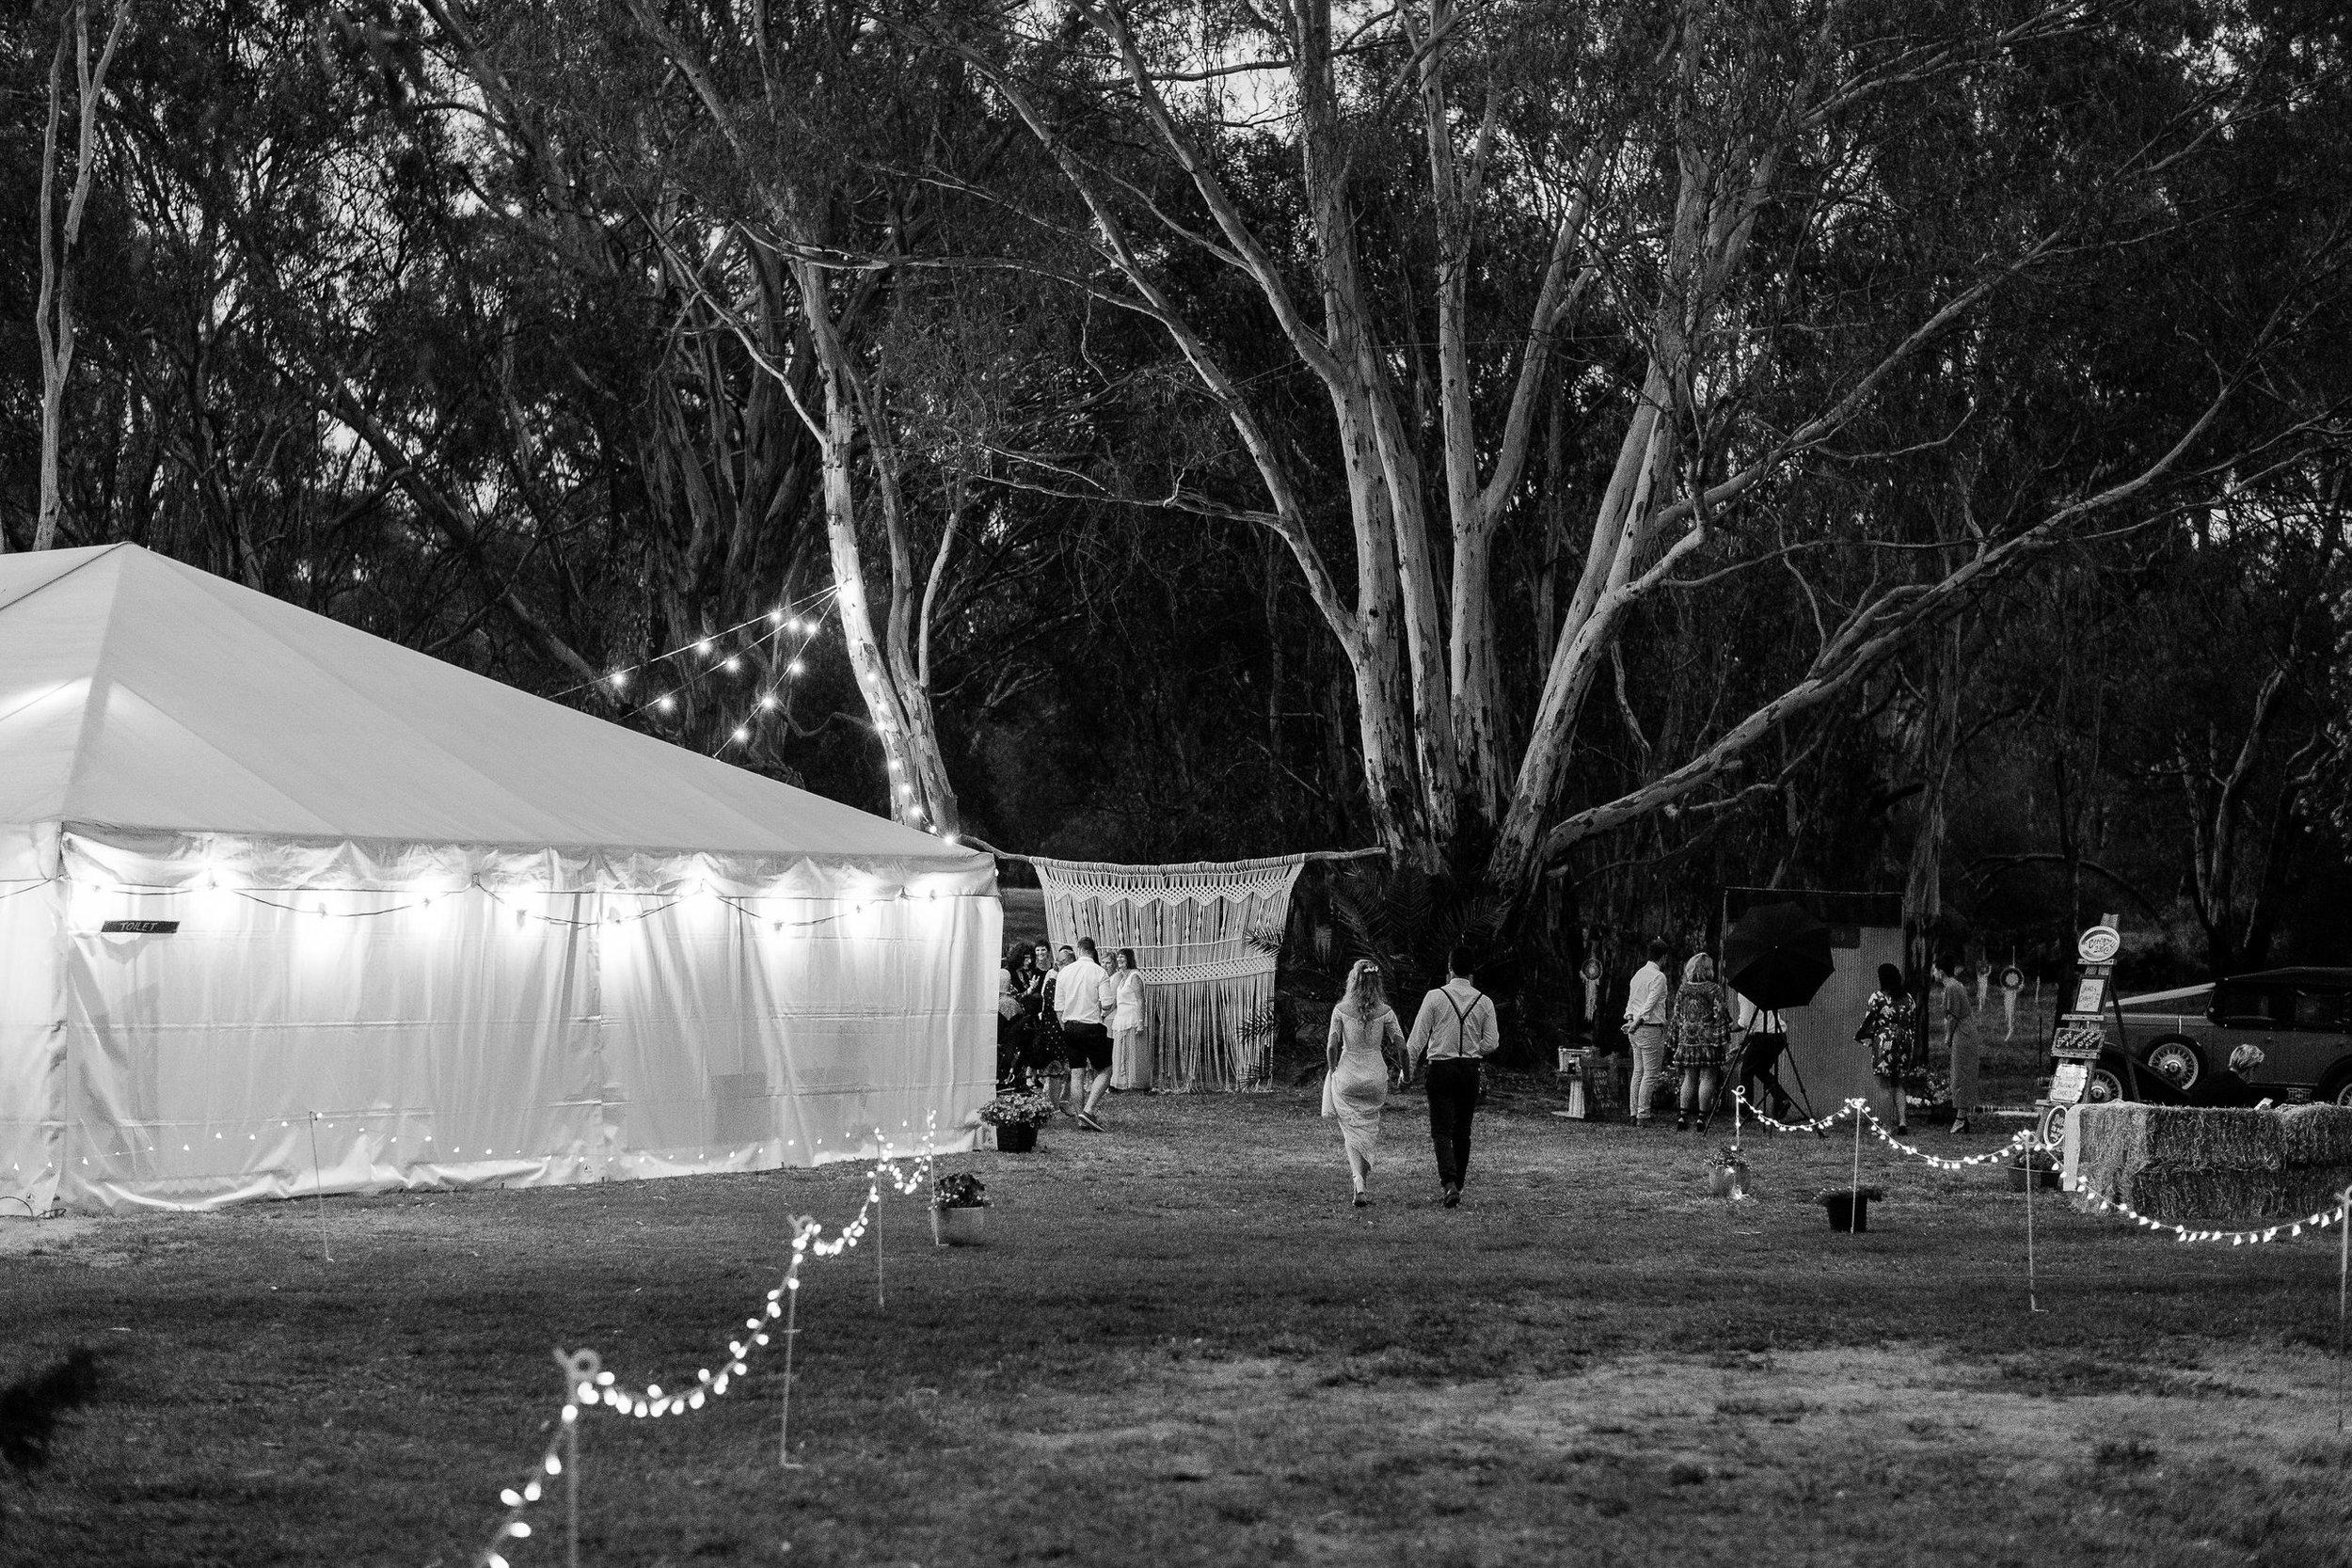 Justin_And_Jim_Photography_Backyard_Wedding227.JPG